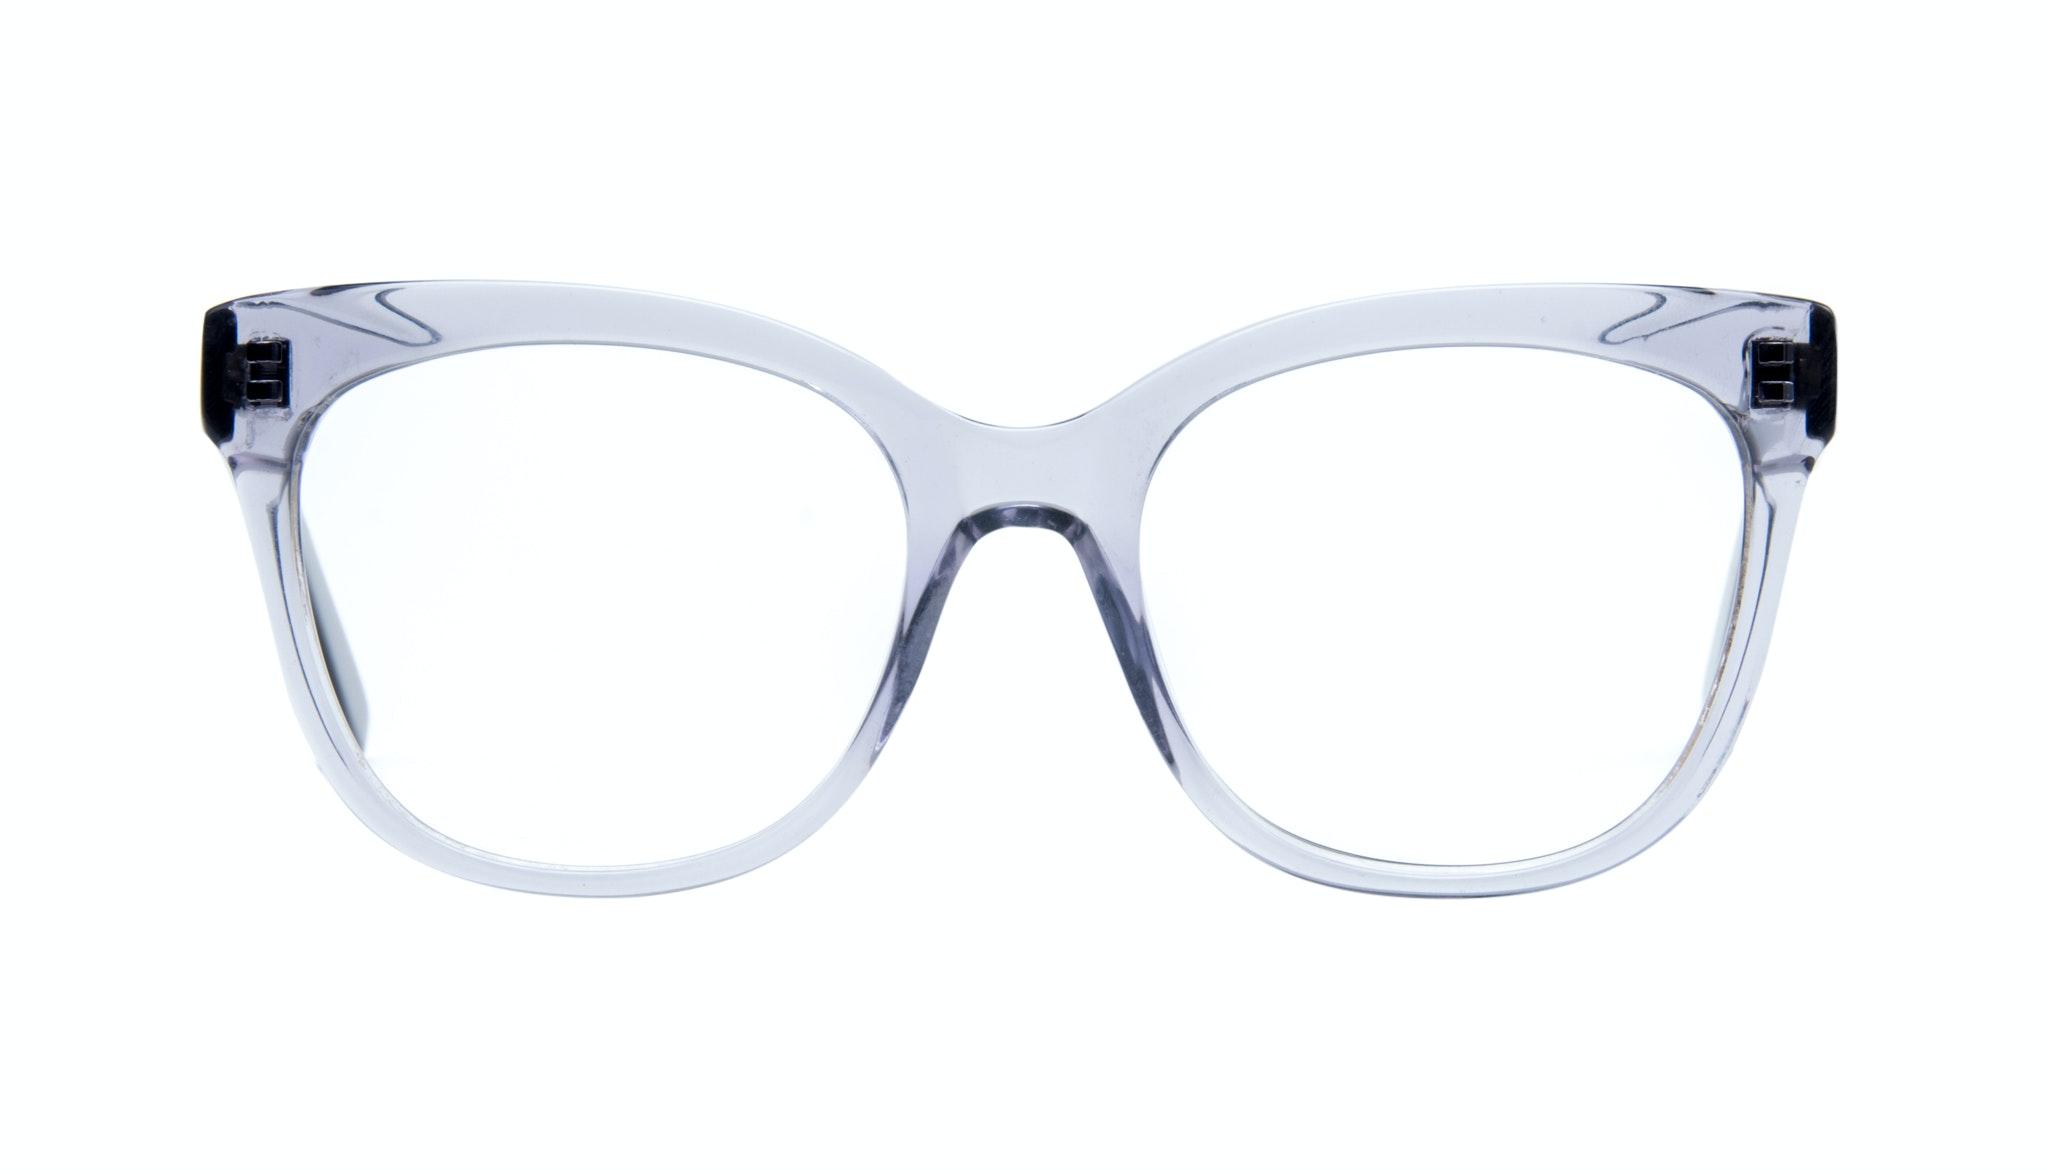 Affordable Fashion Glasses Rectangle Square Eyeglasses Women Breezy Grey Metal Front